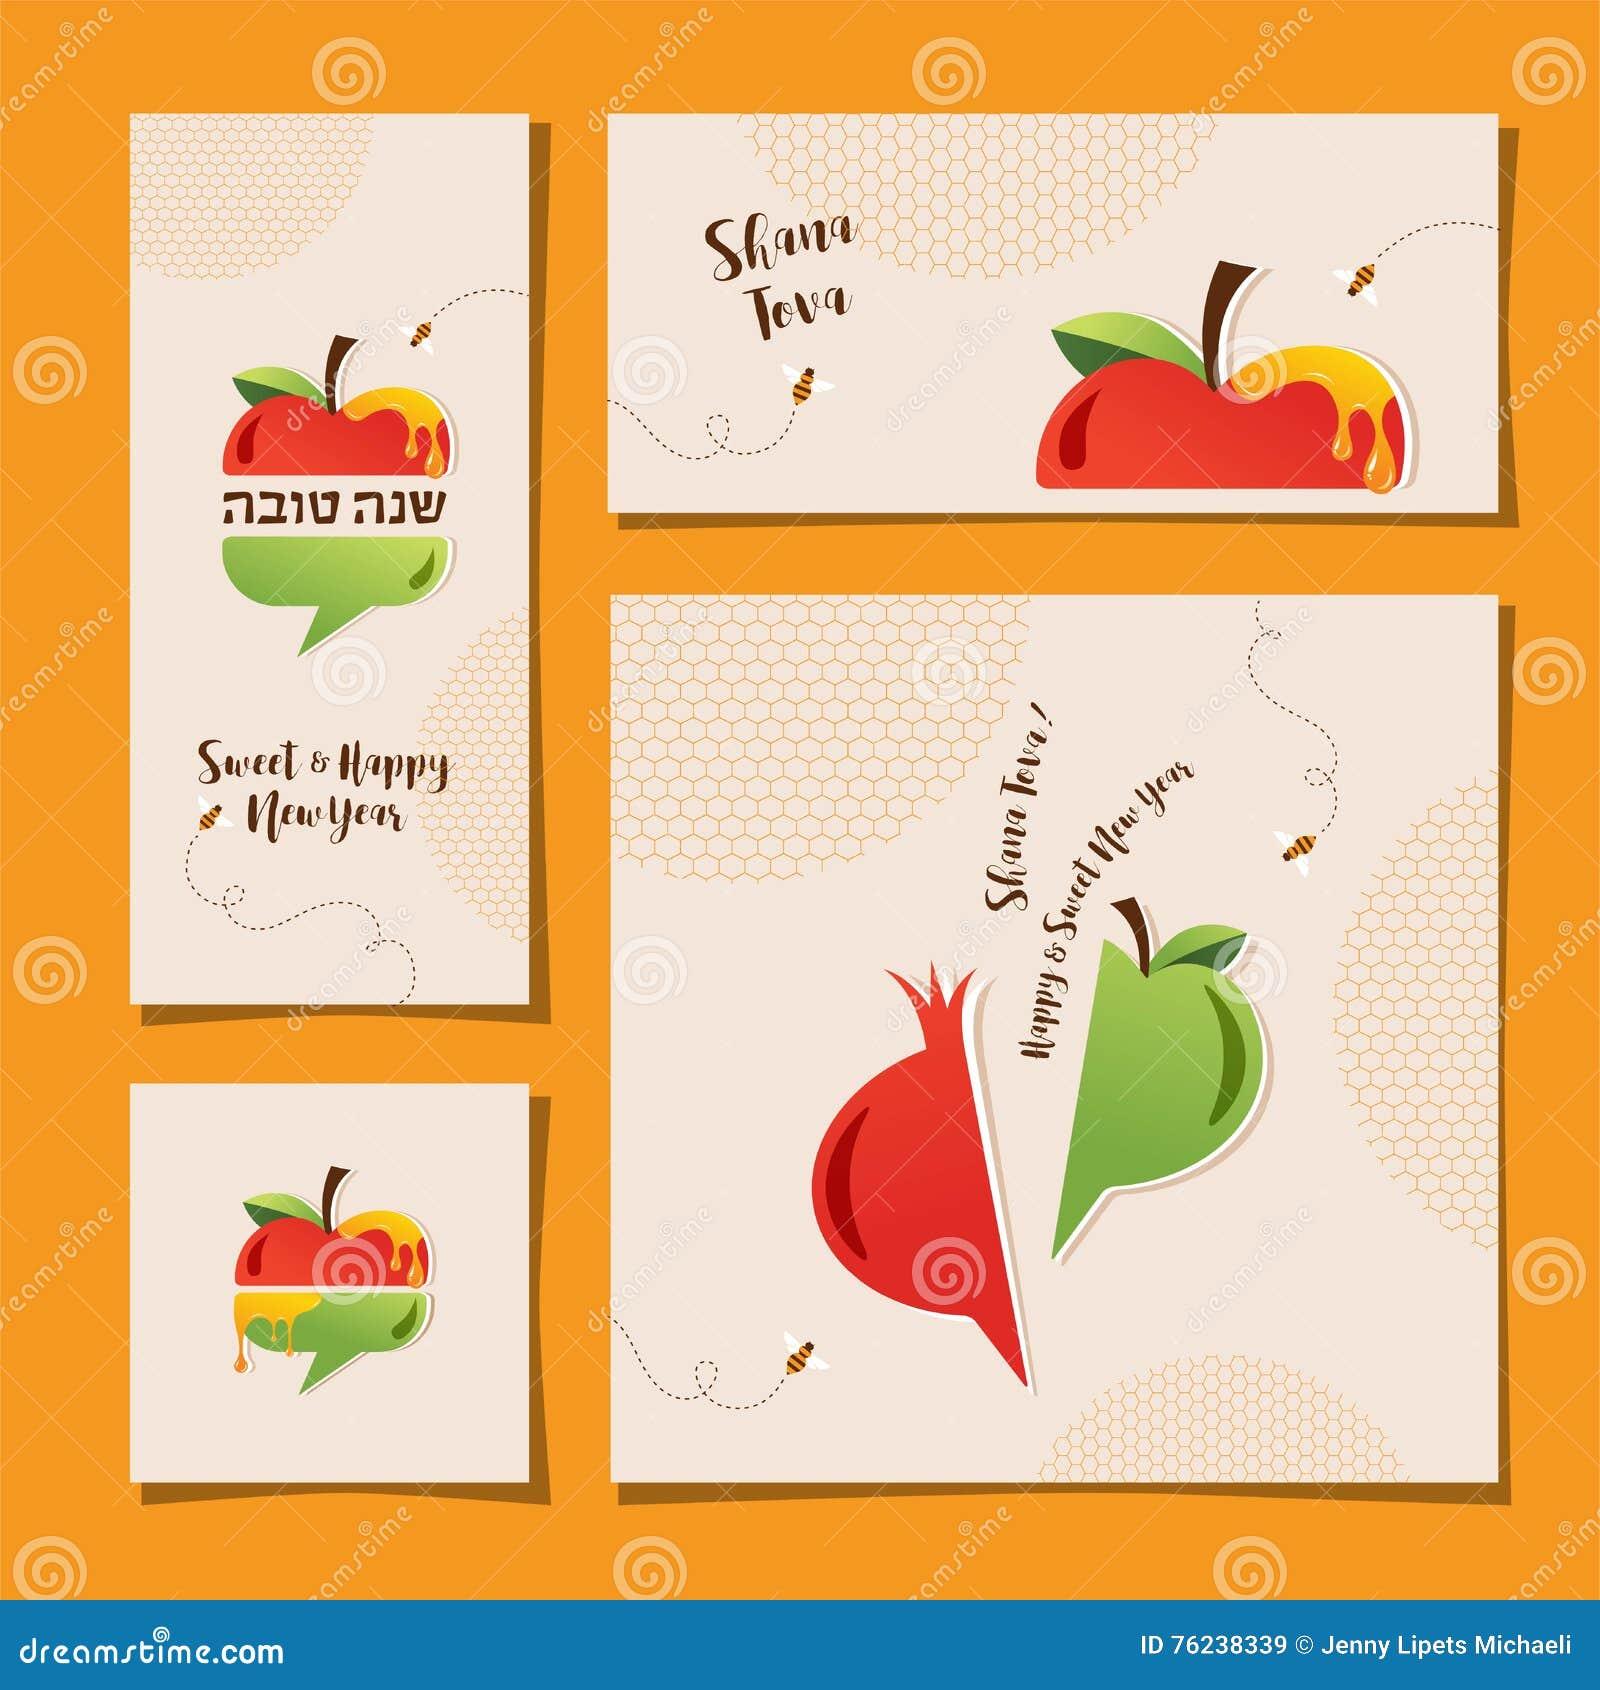 Года, открытки на рош ашана своими руками